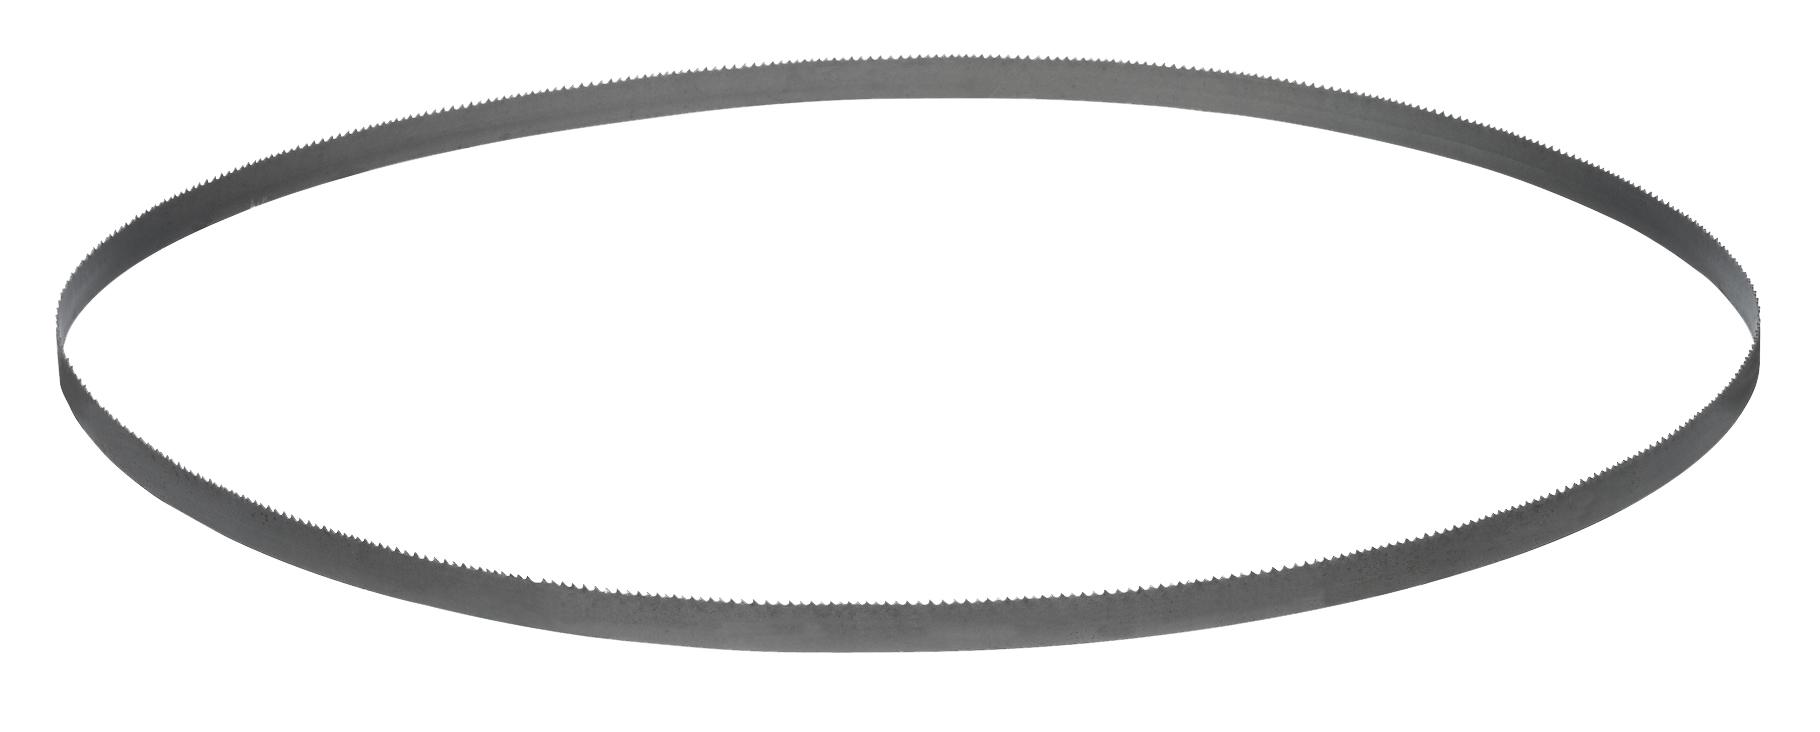 LENOX 35-3/8 X 1/2 18TPI MASTER-BAND COMPACT PORTABLE BAND SAW BLADE 1786675 (PACK= 5 BLADES)